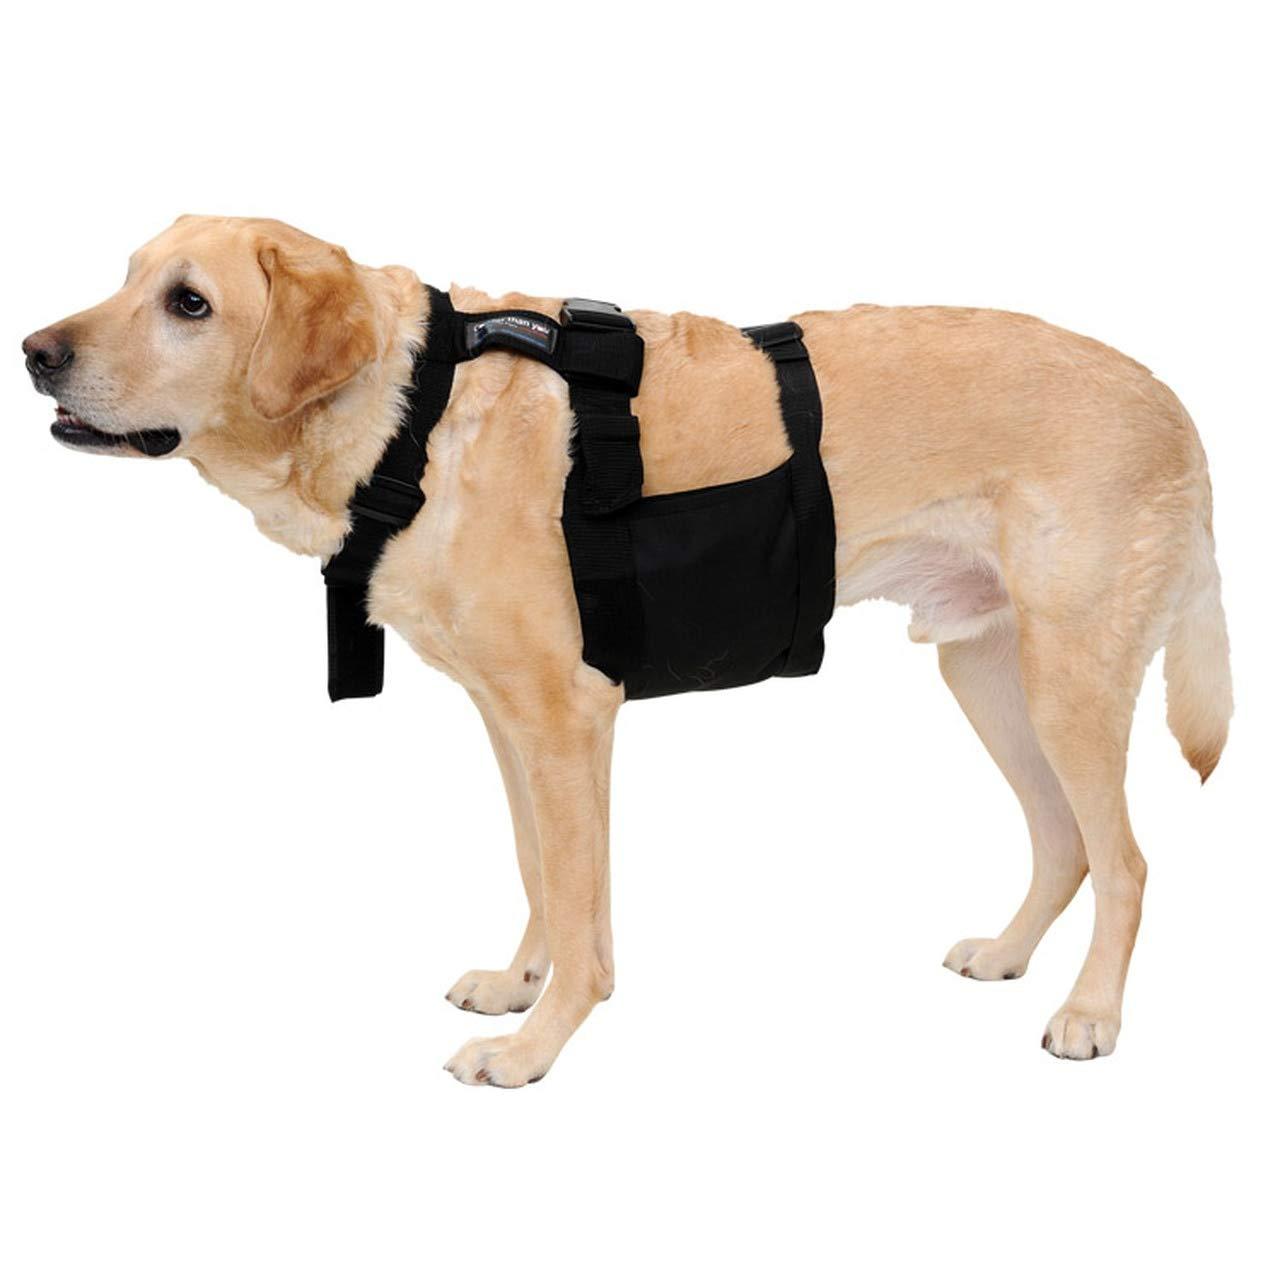 Glacier Tek Chilly Dog Cool Vest with nontoxic Cooling Packs